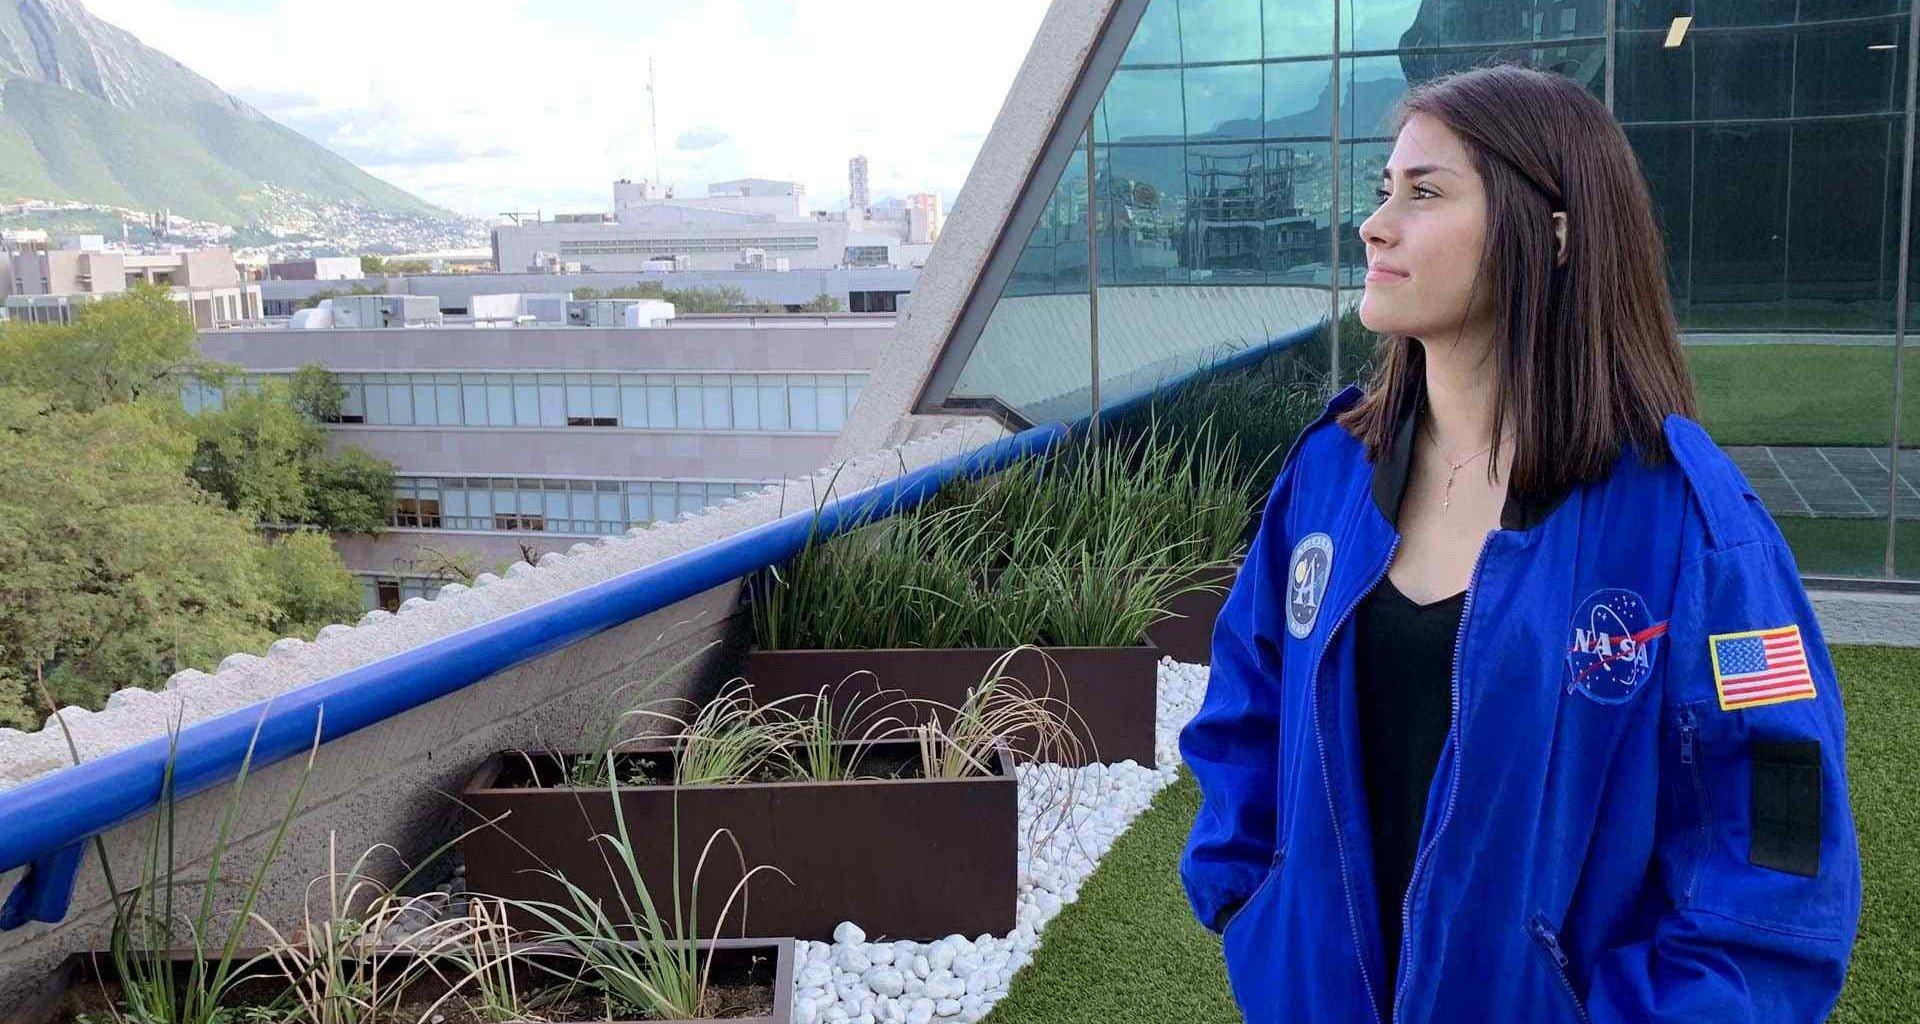 Estefania Oseguera Quiere Ser Astronauta